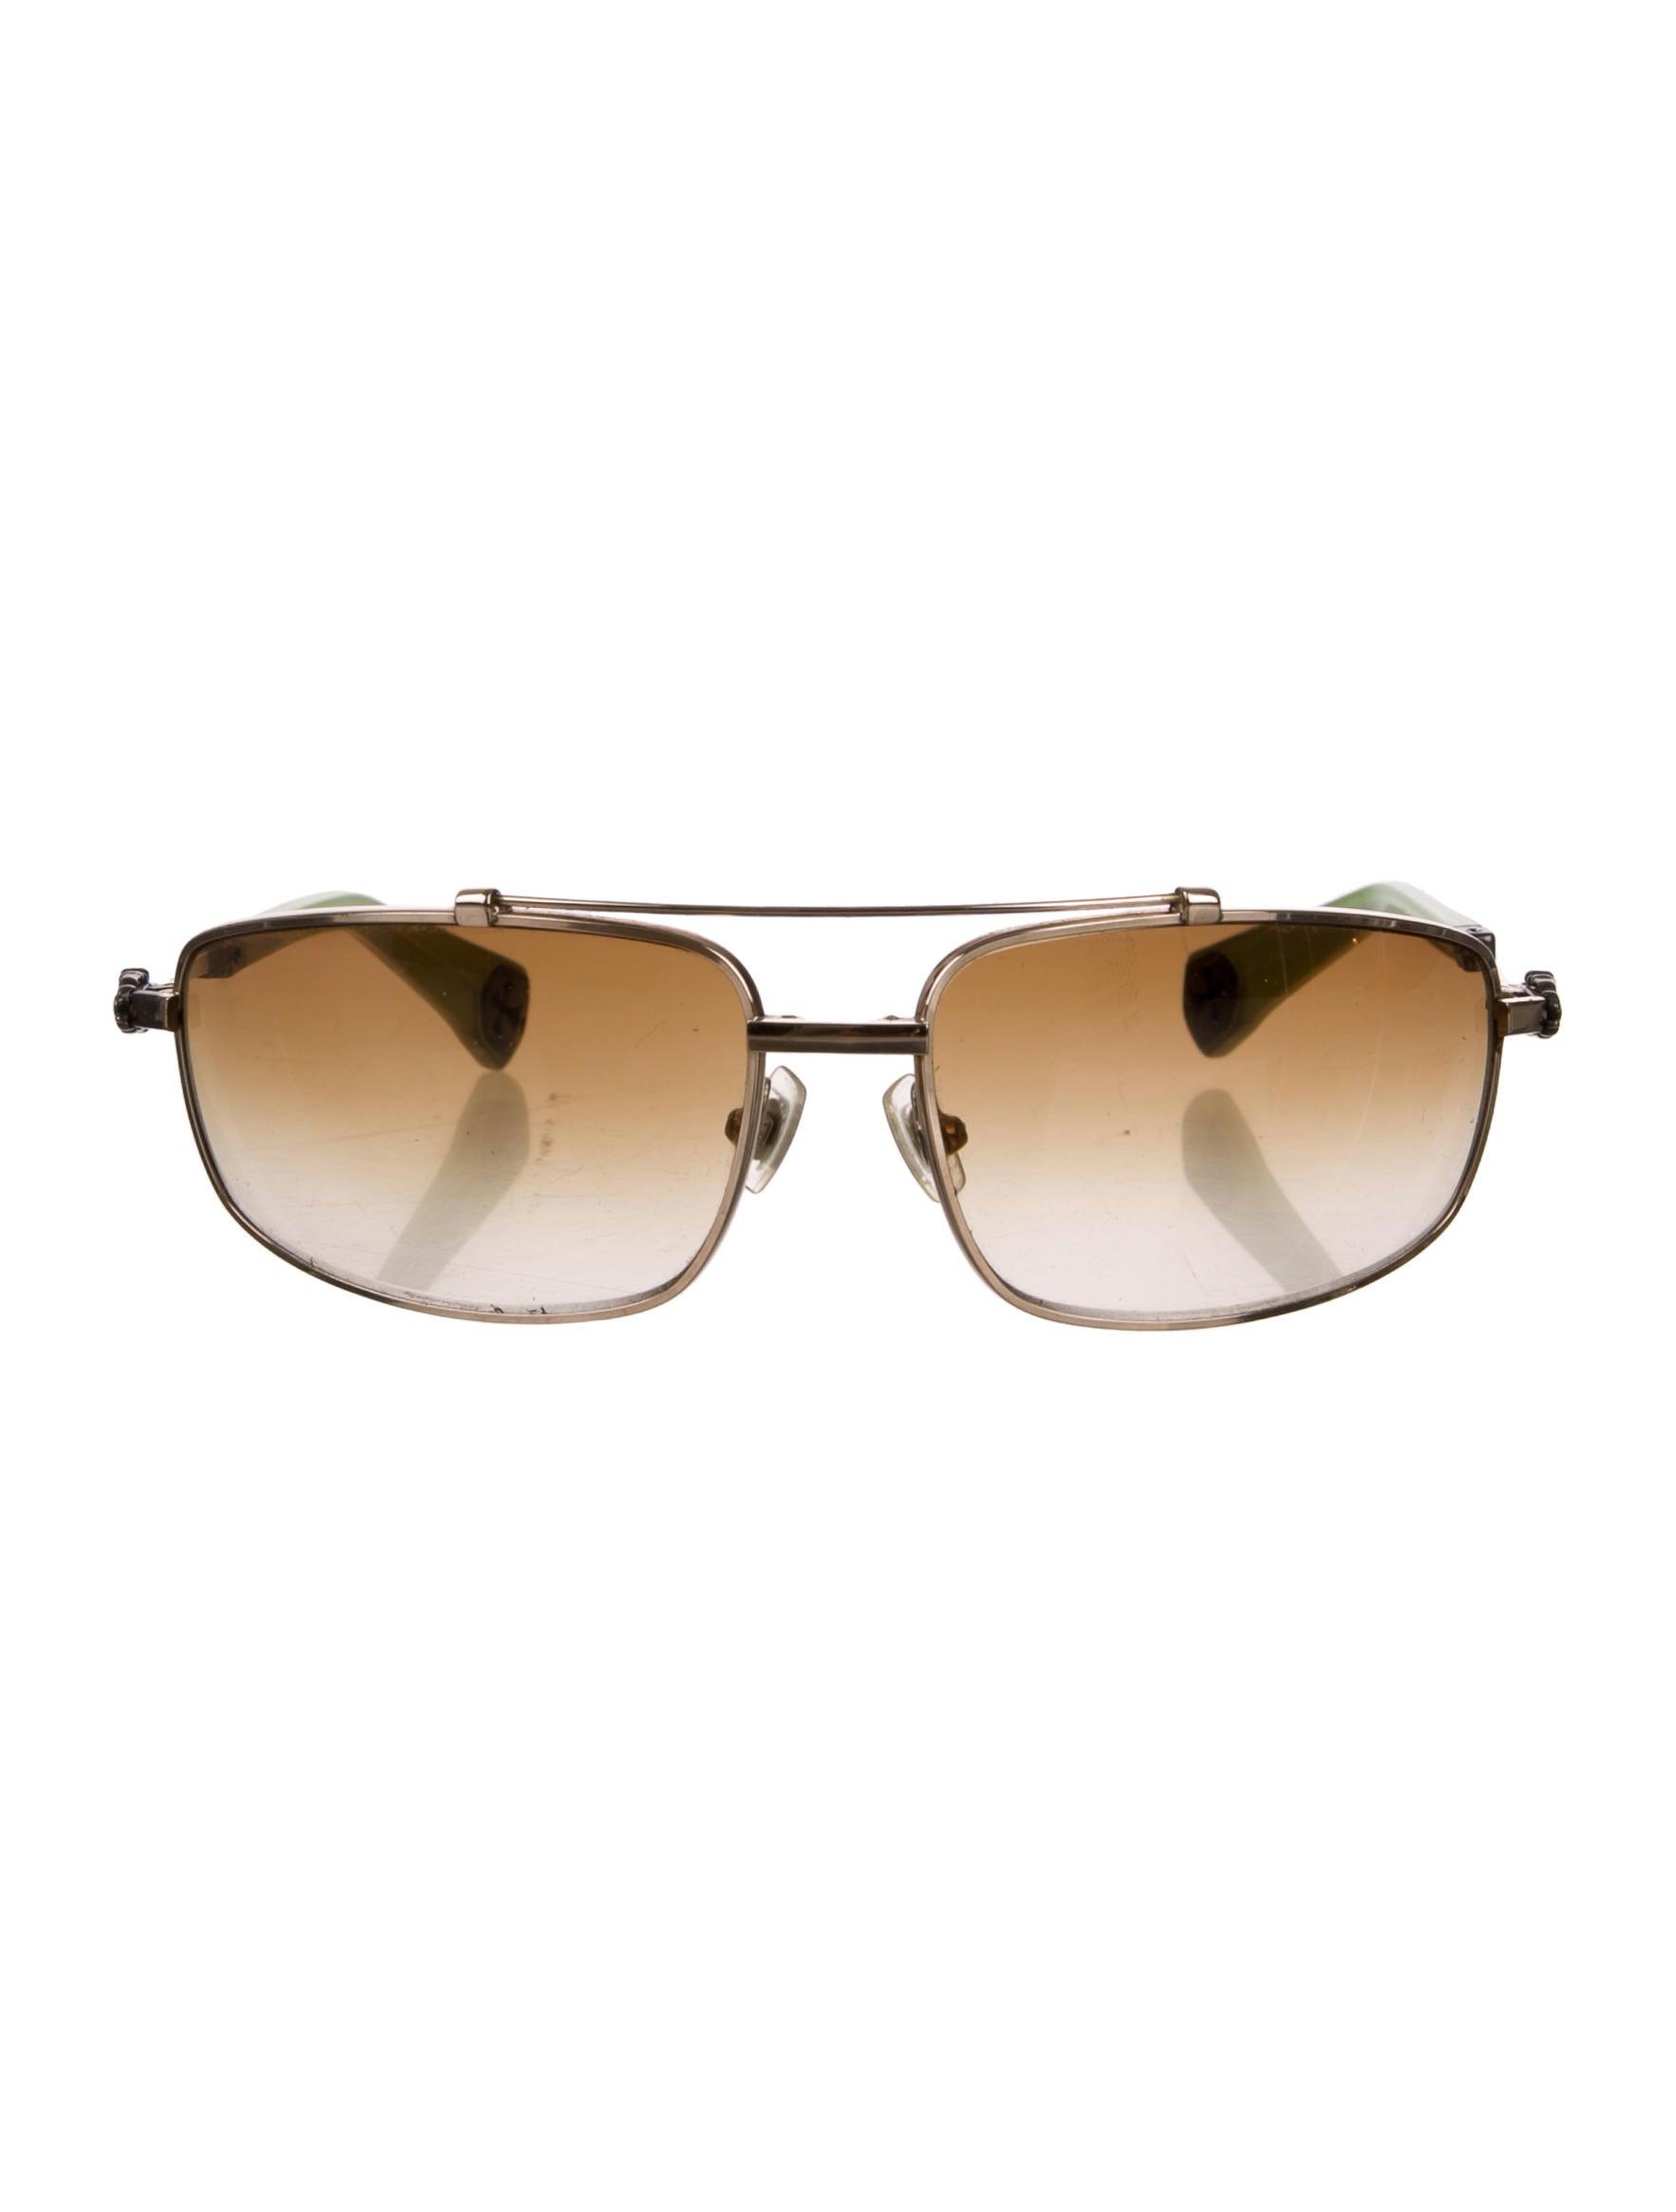 a5c8577cd4cc Chrome Hearts Sunglasses Aviator « Heritage Malta